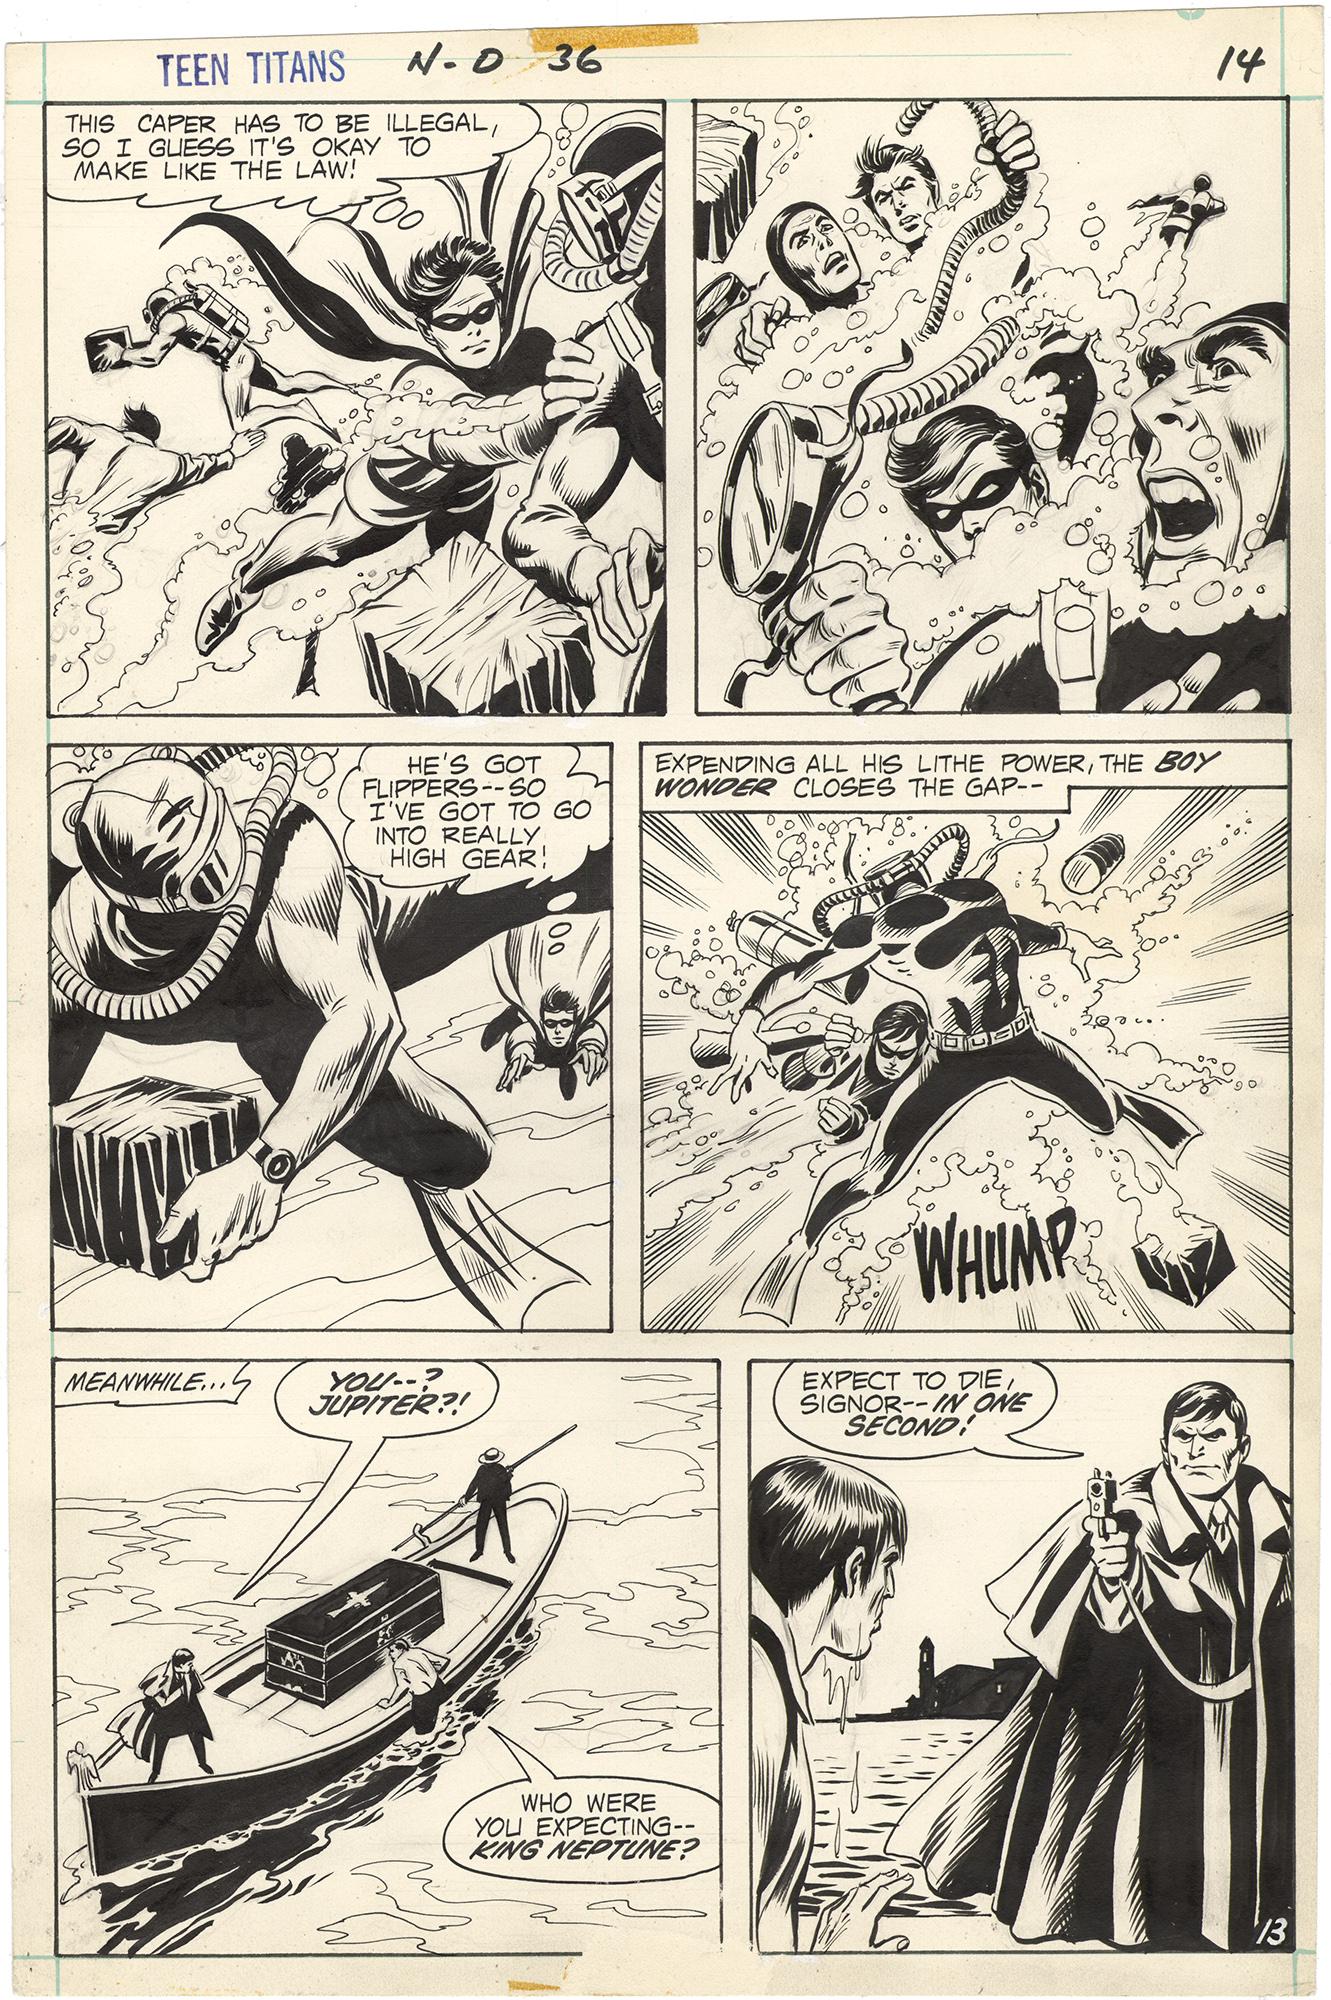 Teen Titans, #36, p13